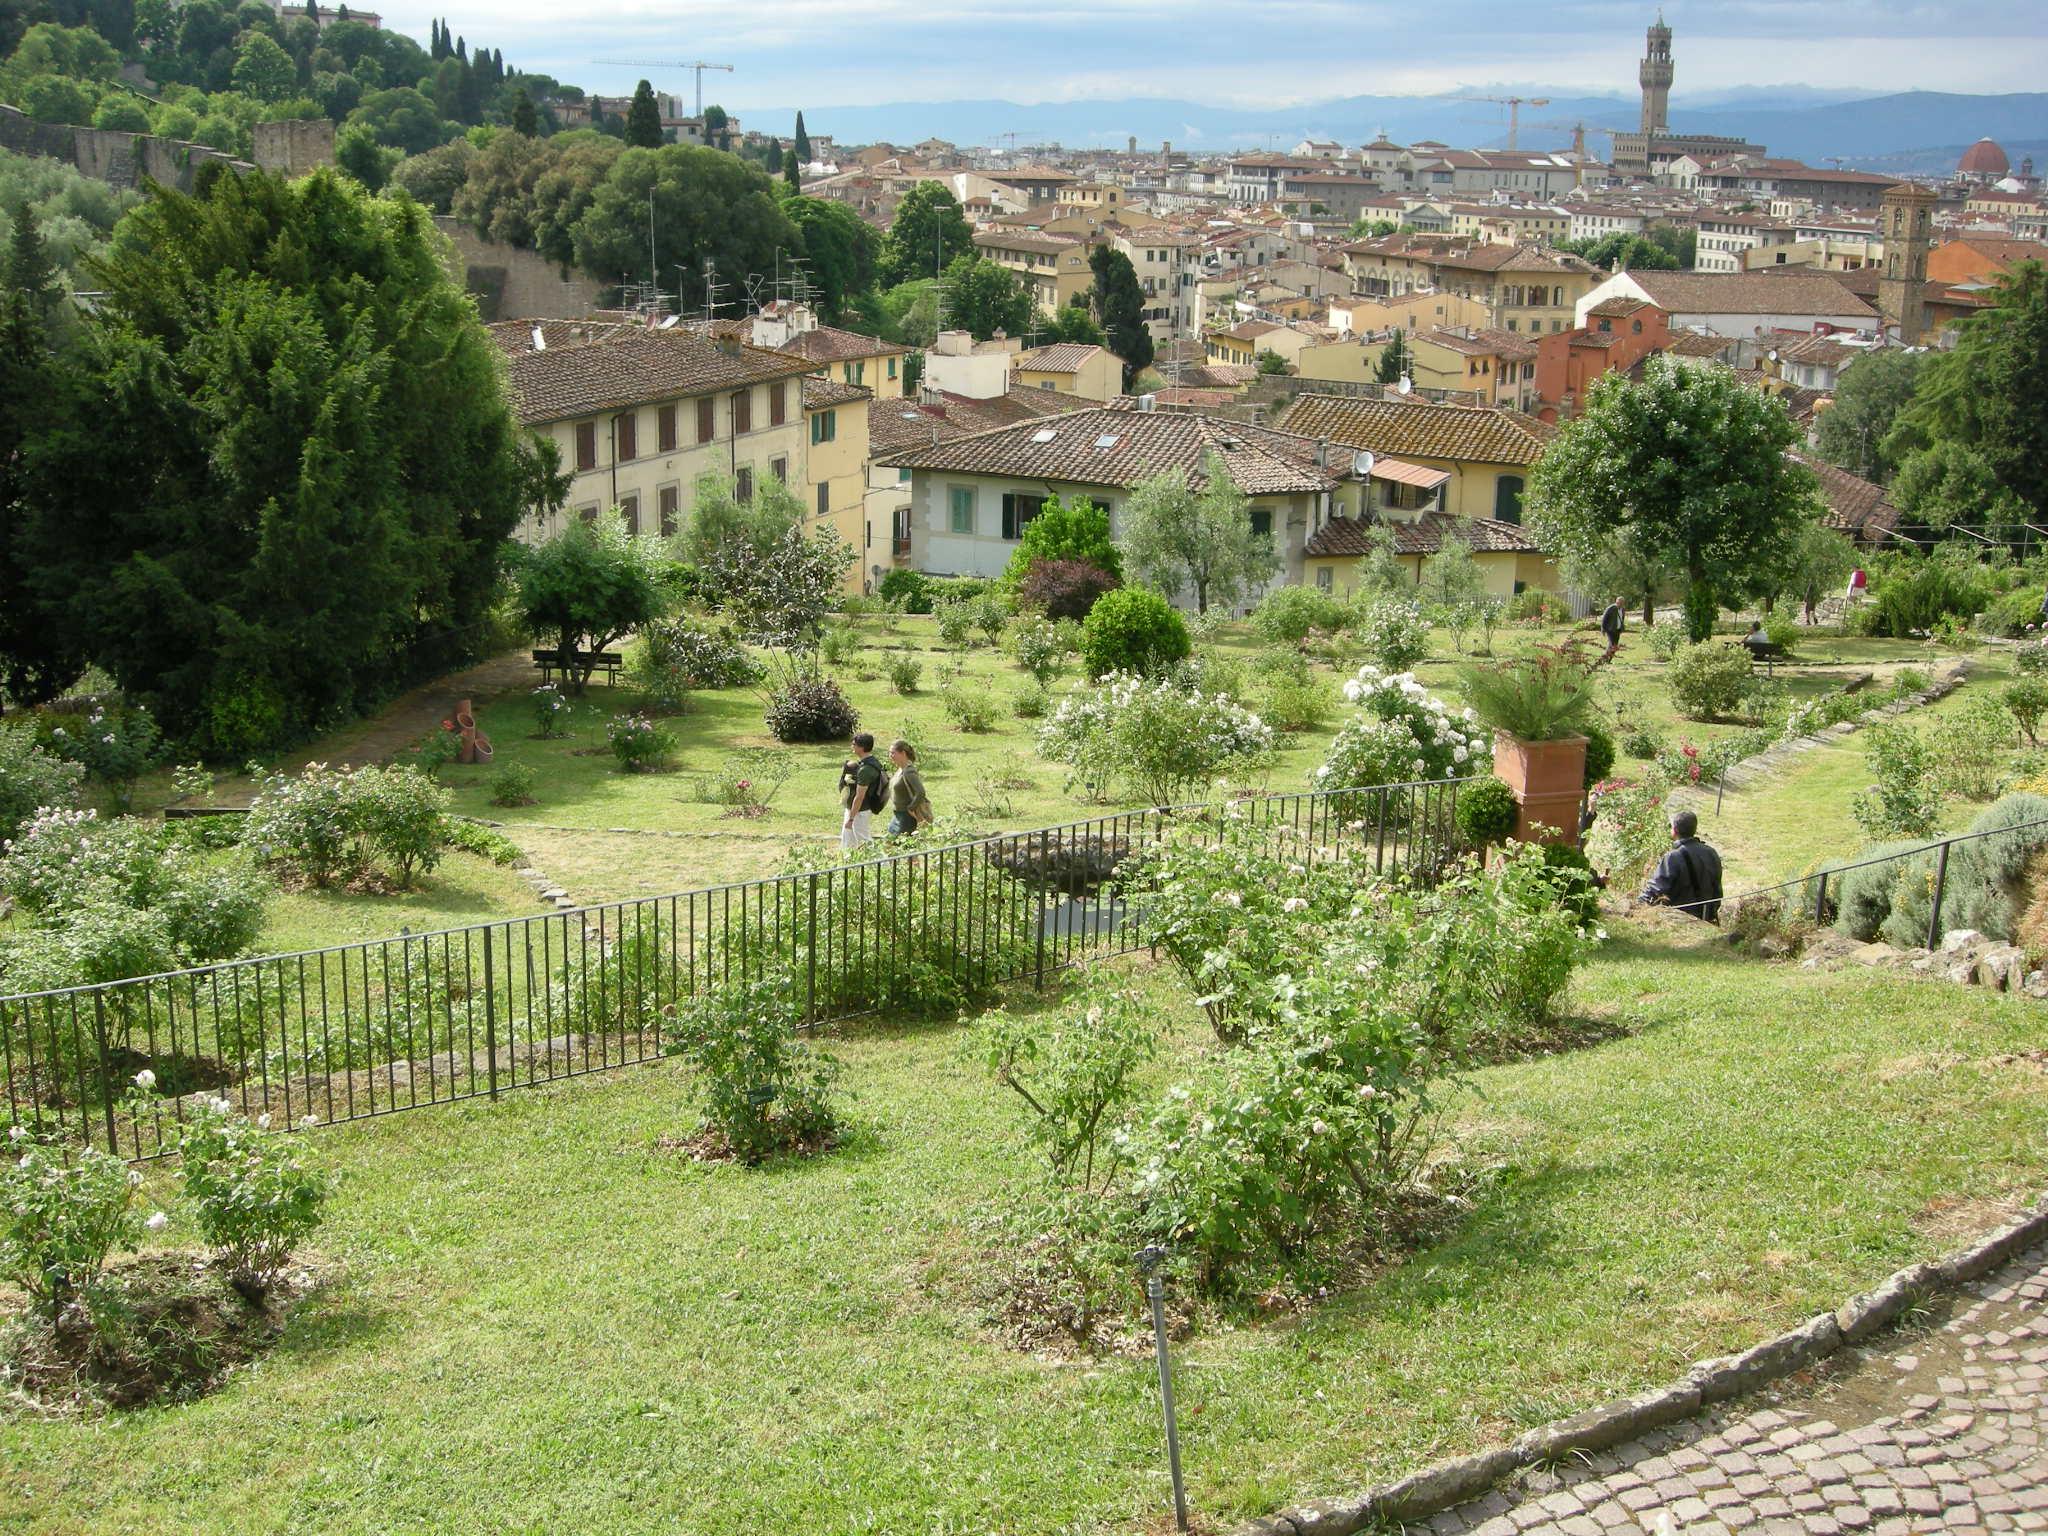 Italian botanical heritage giardino delle rose - Giardino con rose ...